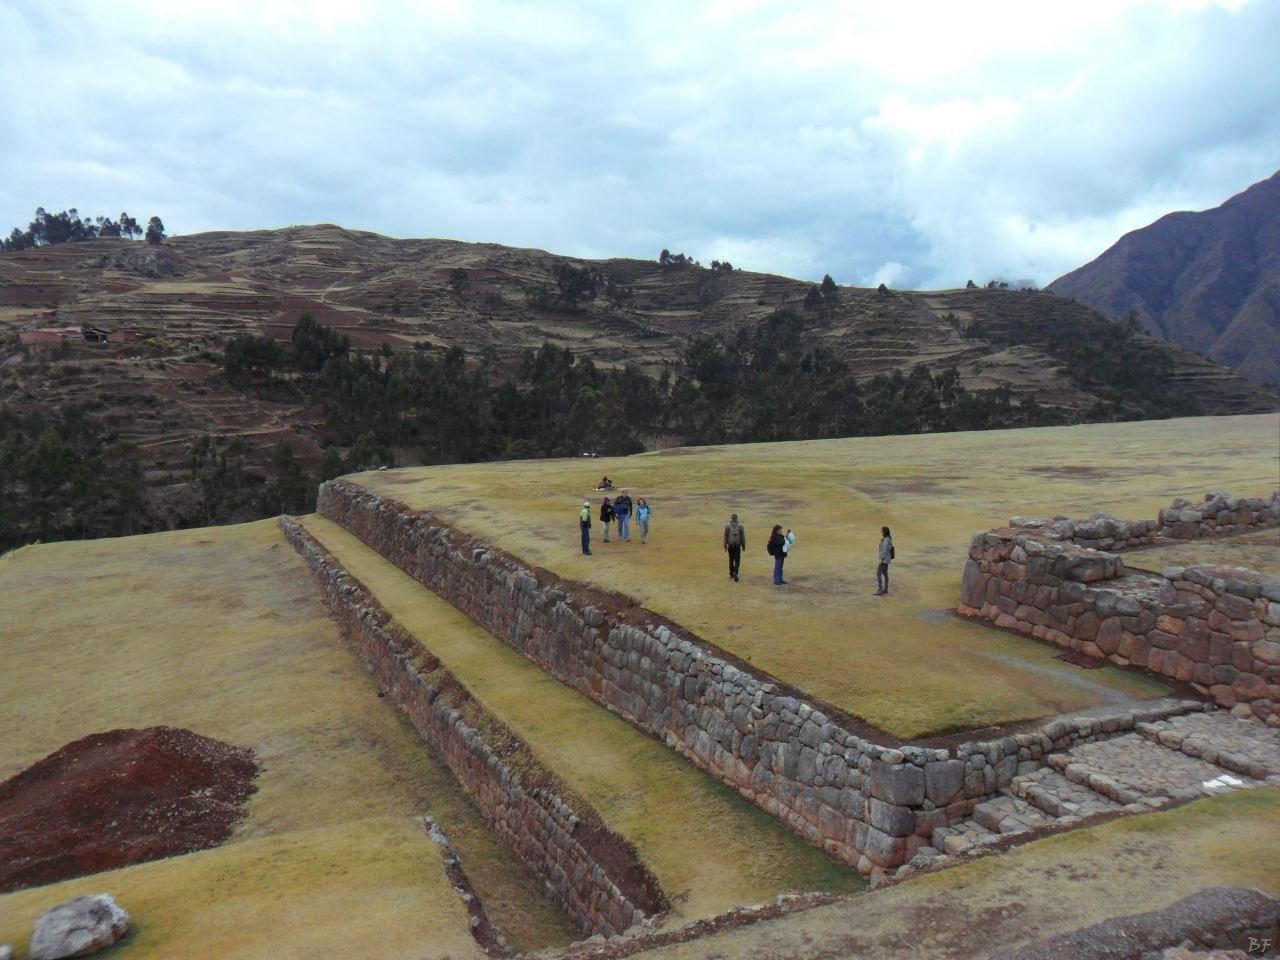 Chinchero-Mura-Poligonali-Piramide-Urubamba-Peru-23